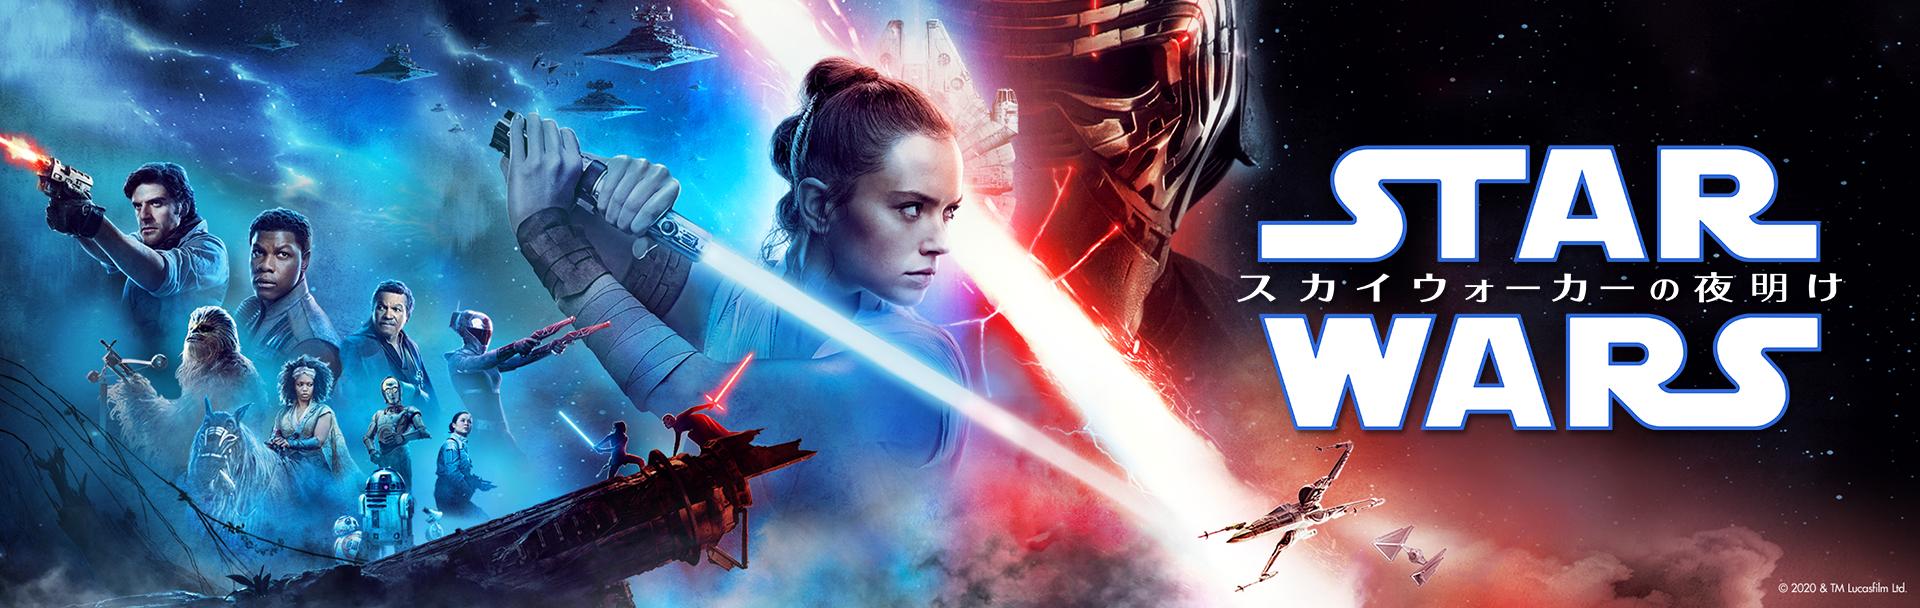 Star_Wars_Rise_Of_Skywalker_JPN_Keyart_L316_HD_1920x608-5e46e33e8256880a9a895c85